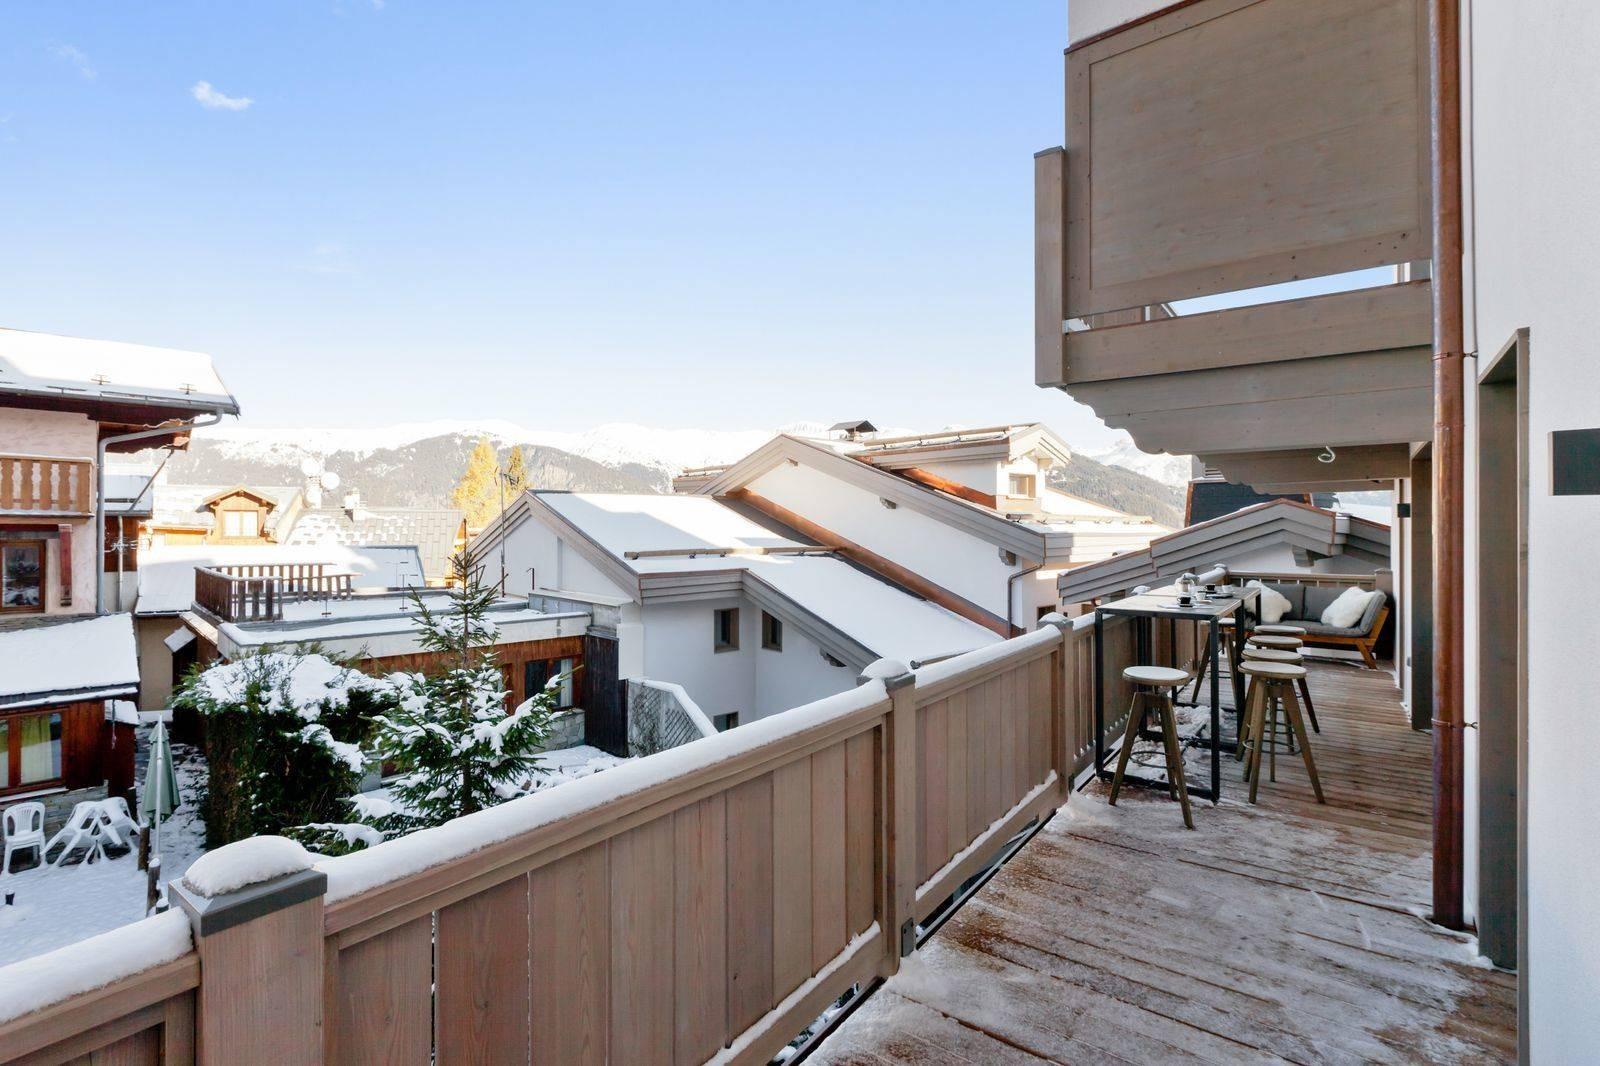 Courchevel 1550 Location Appartement Luxe Telokia Terrasse